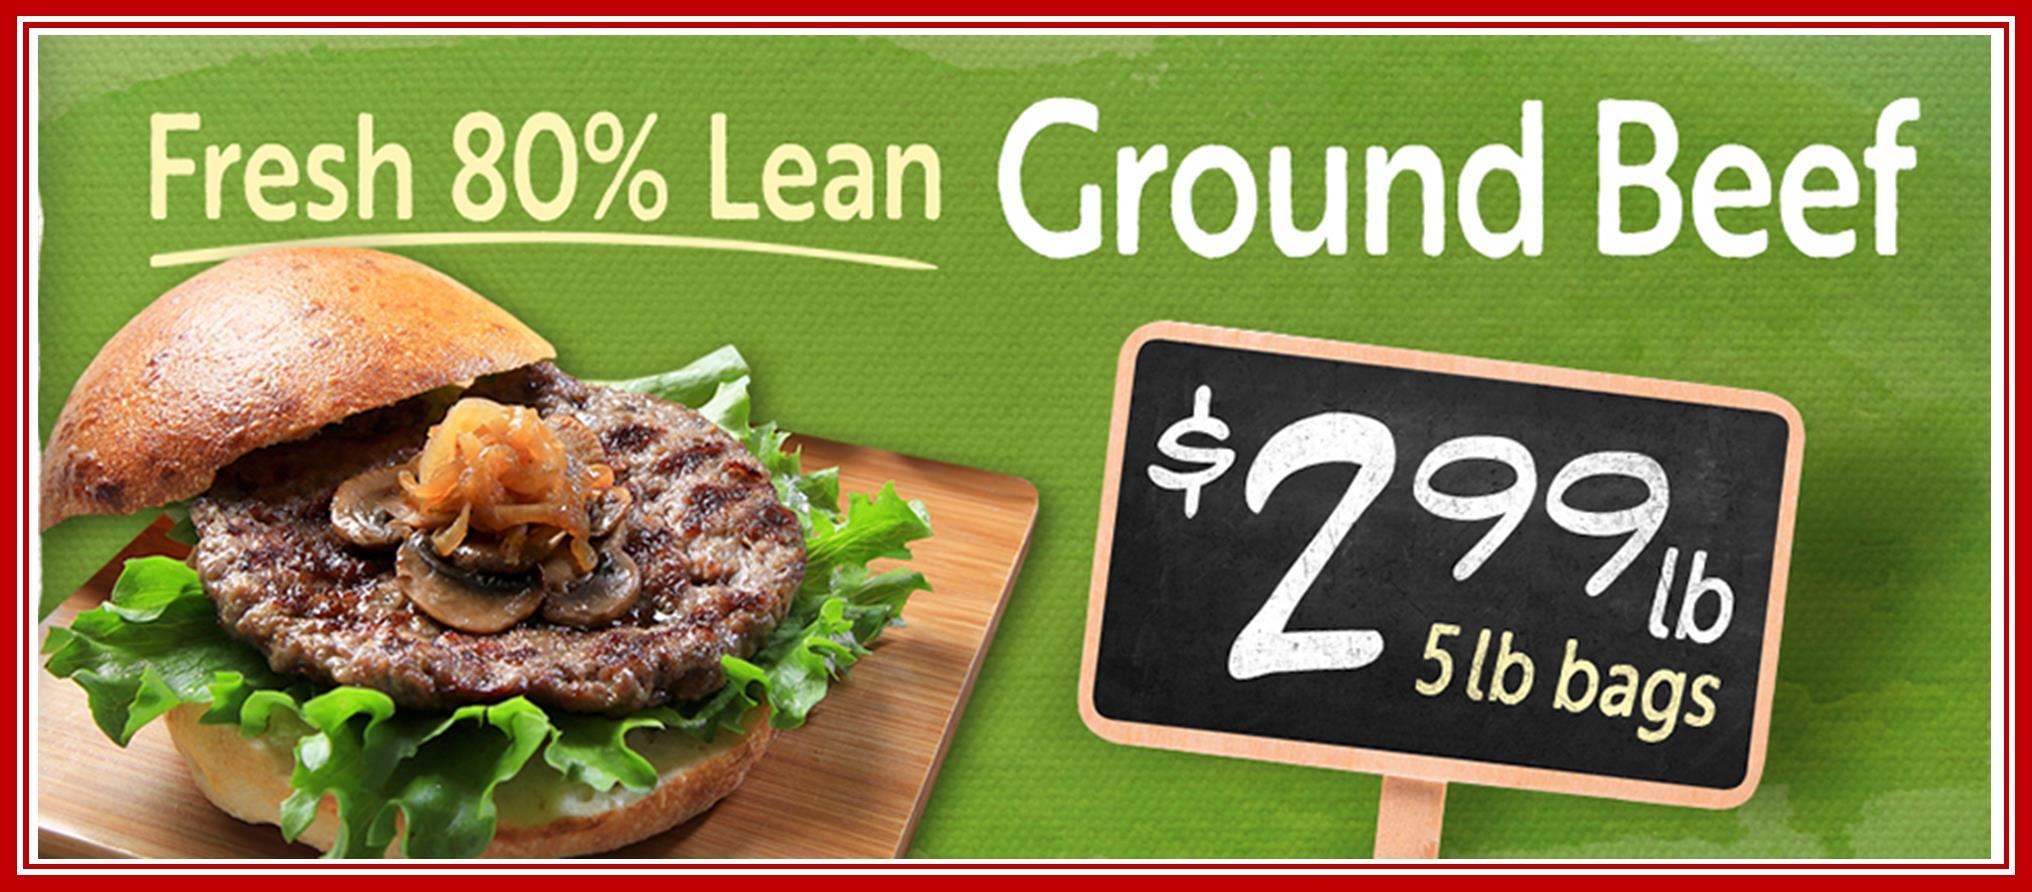 Ground Beef 2.99 New.jpg